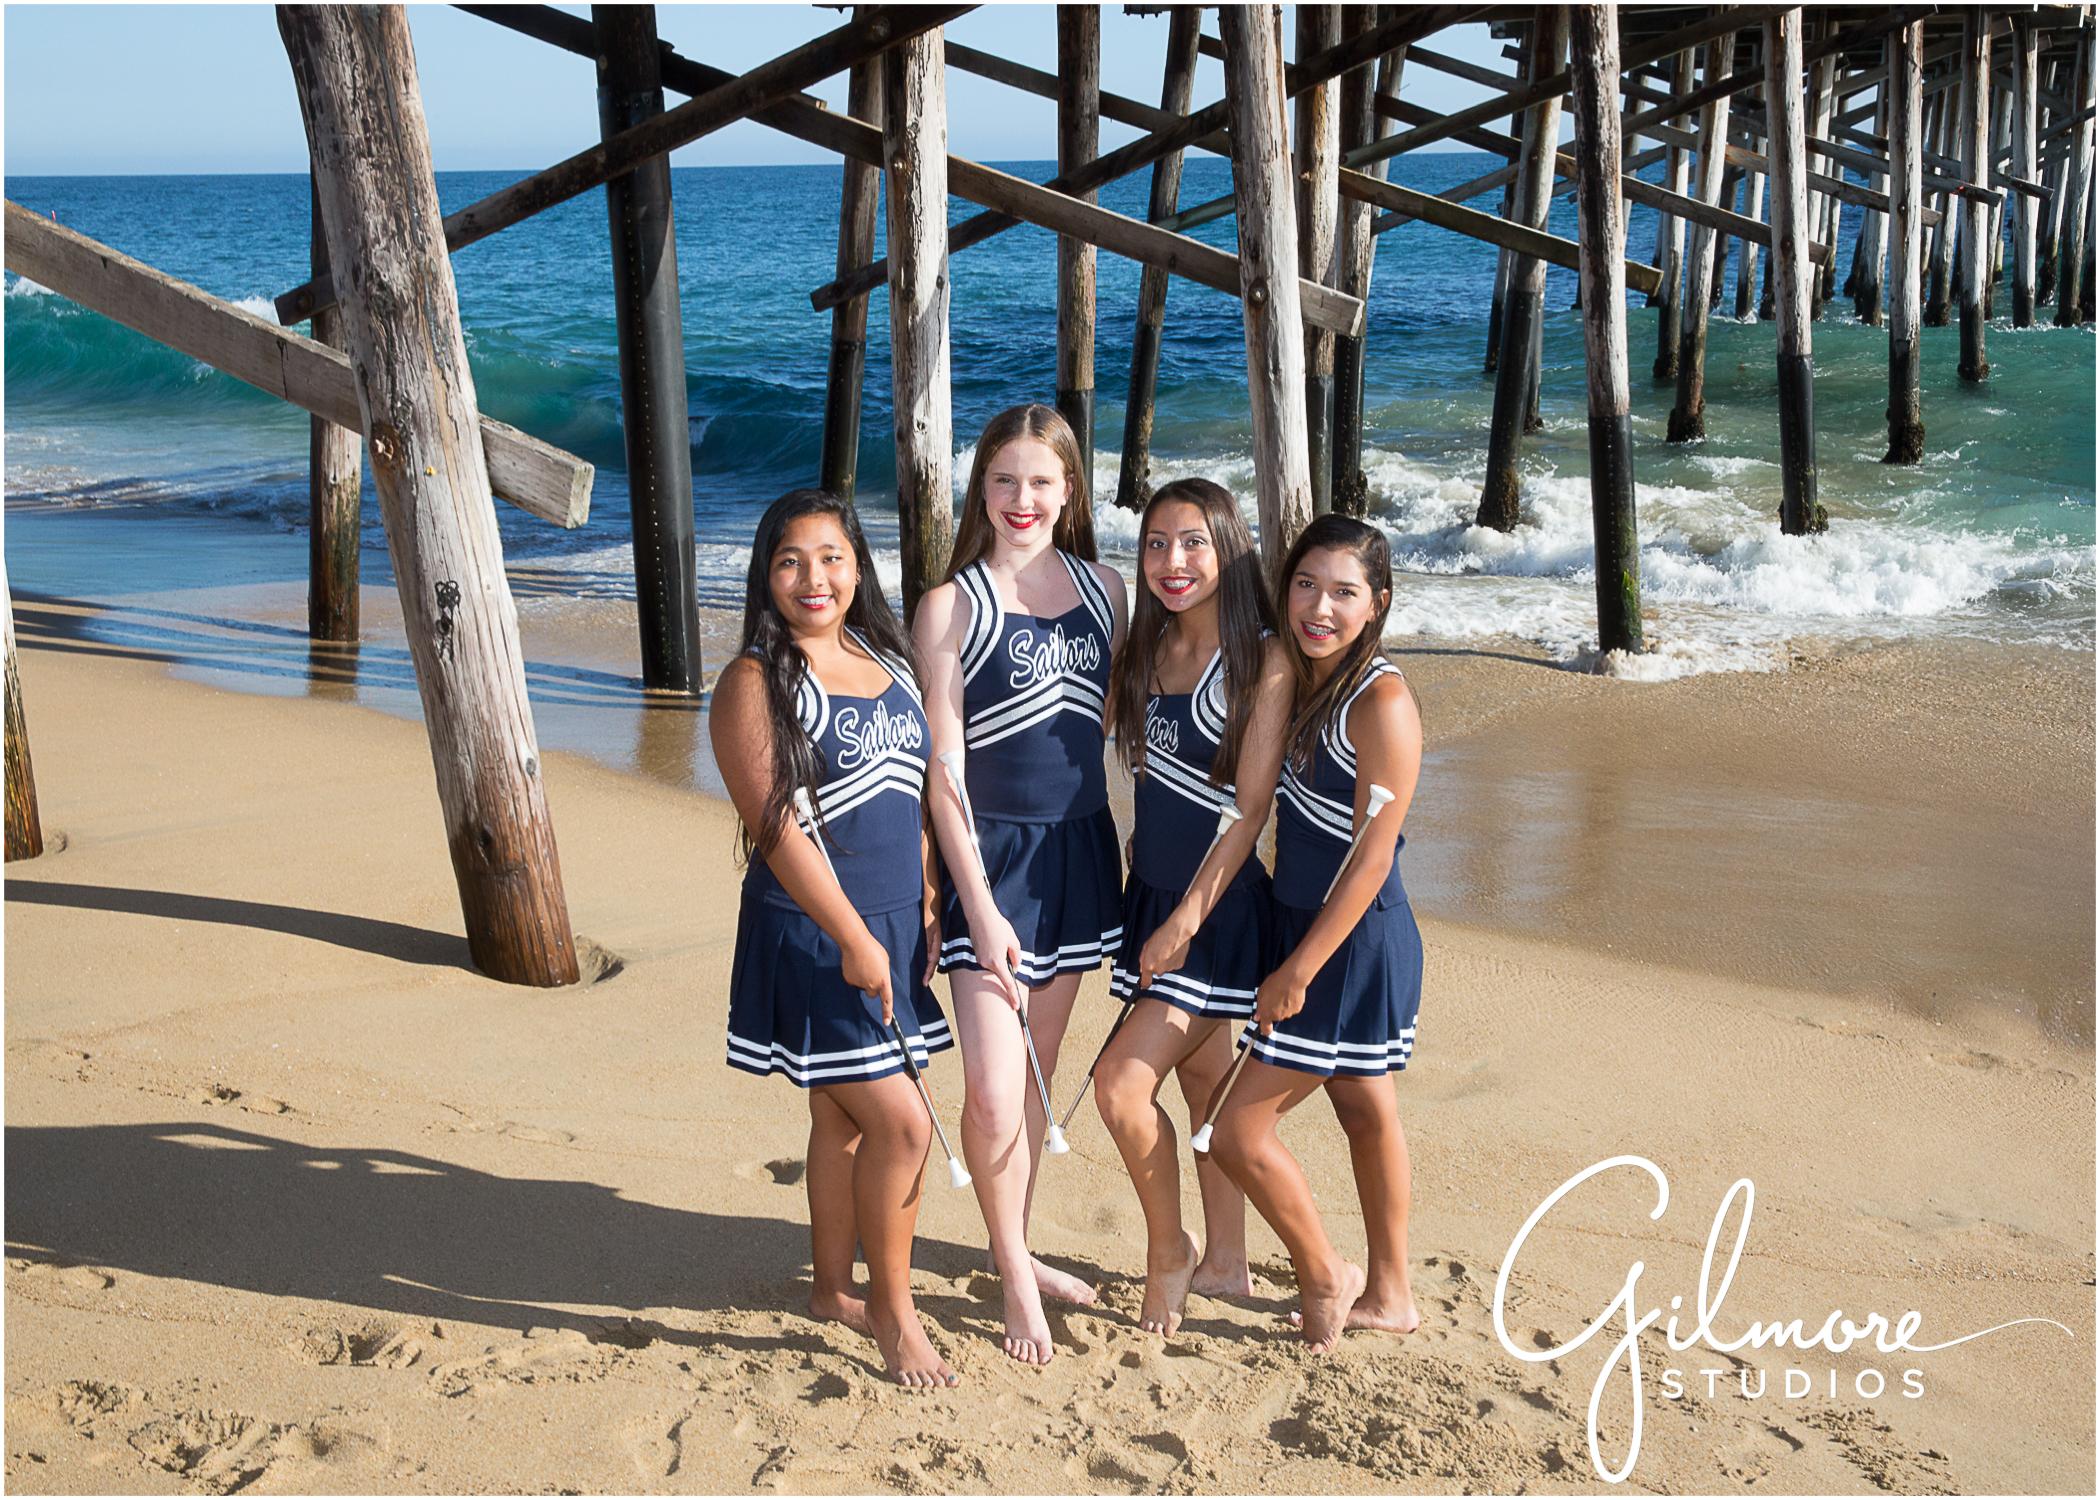 2 newport beach balboa pier cheer squad team photo gilmore studios - newport beach wedding photographer